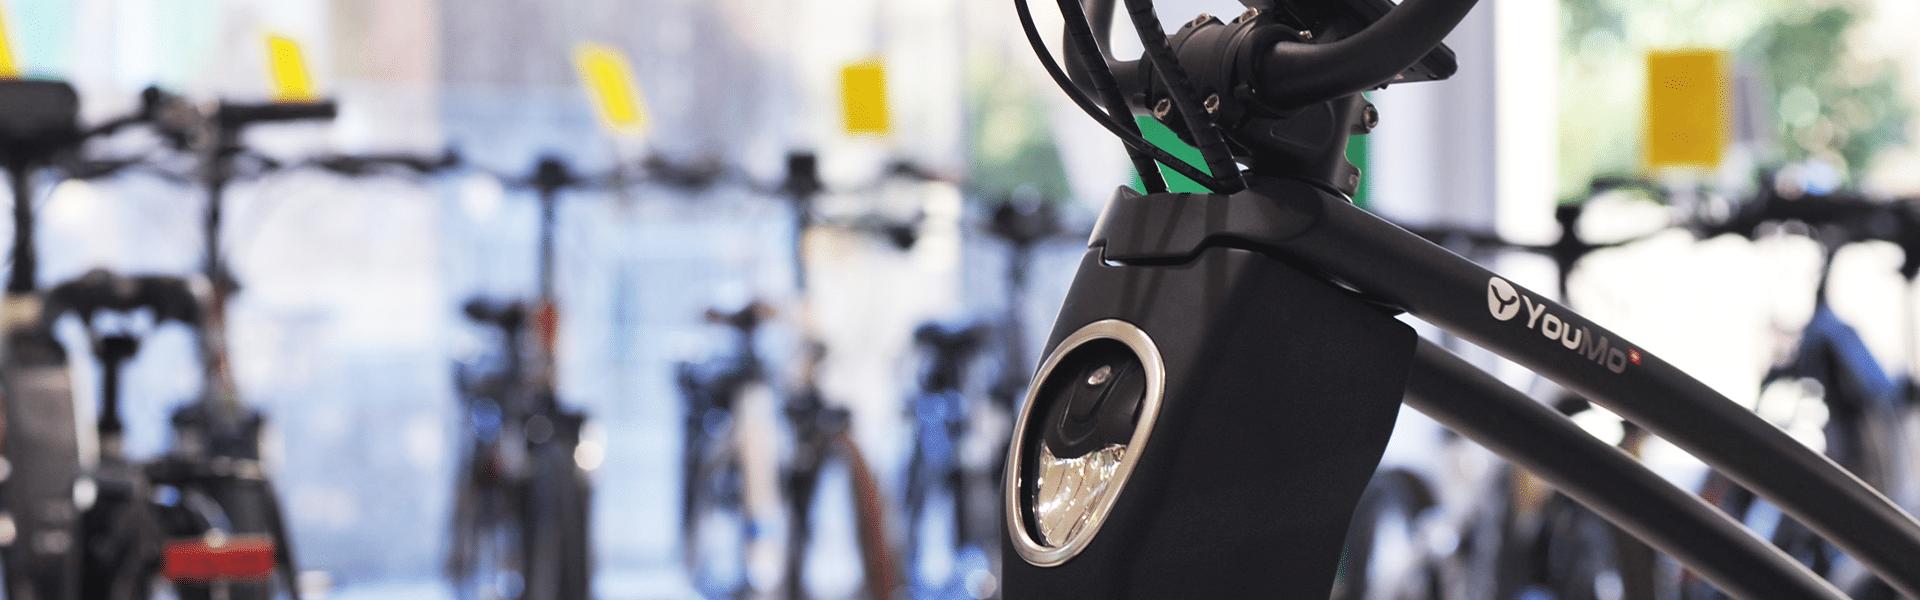 Der Shop der e-motion e-Bike Welt Dietikon